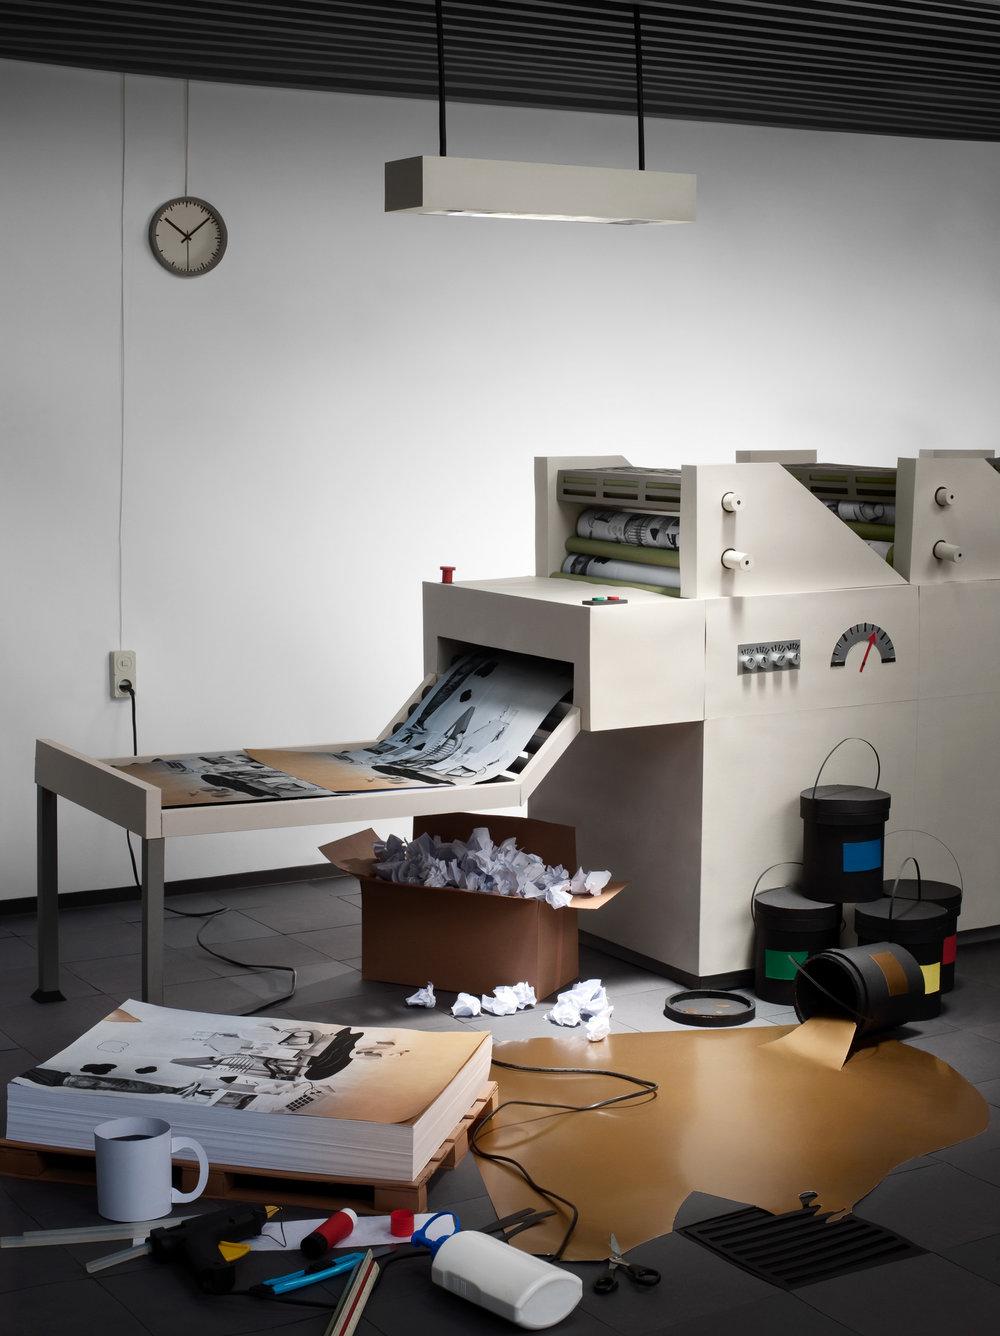 Printing Press - Free